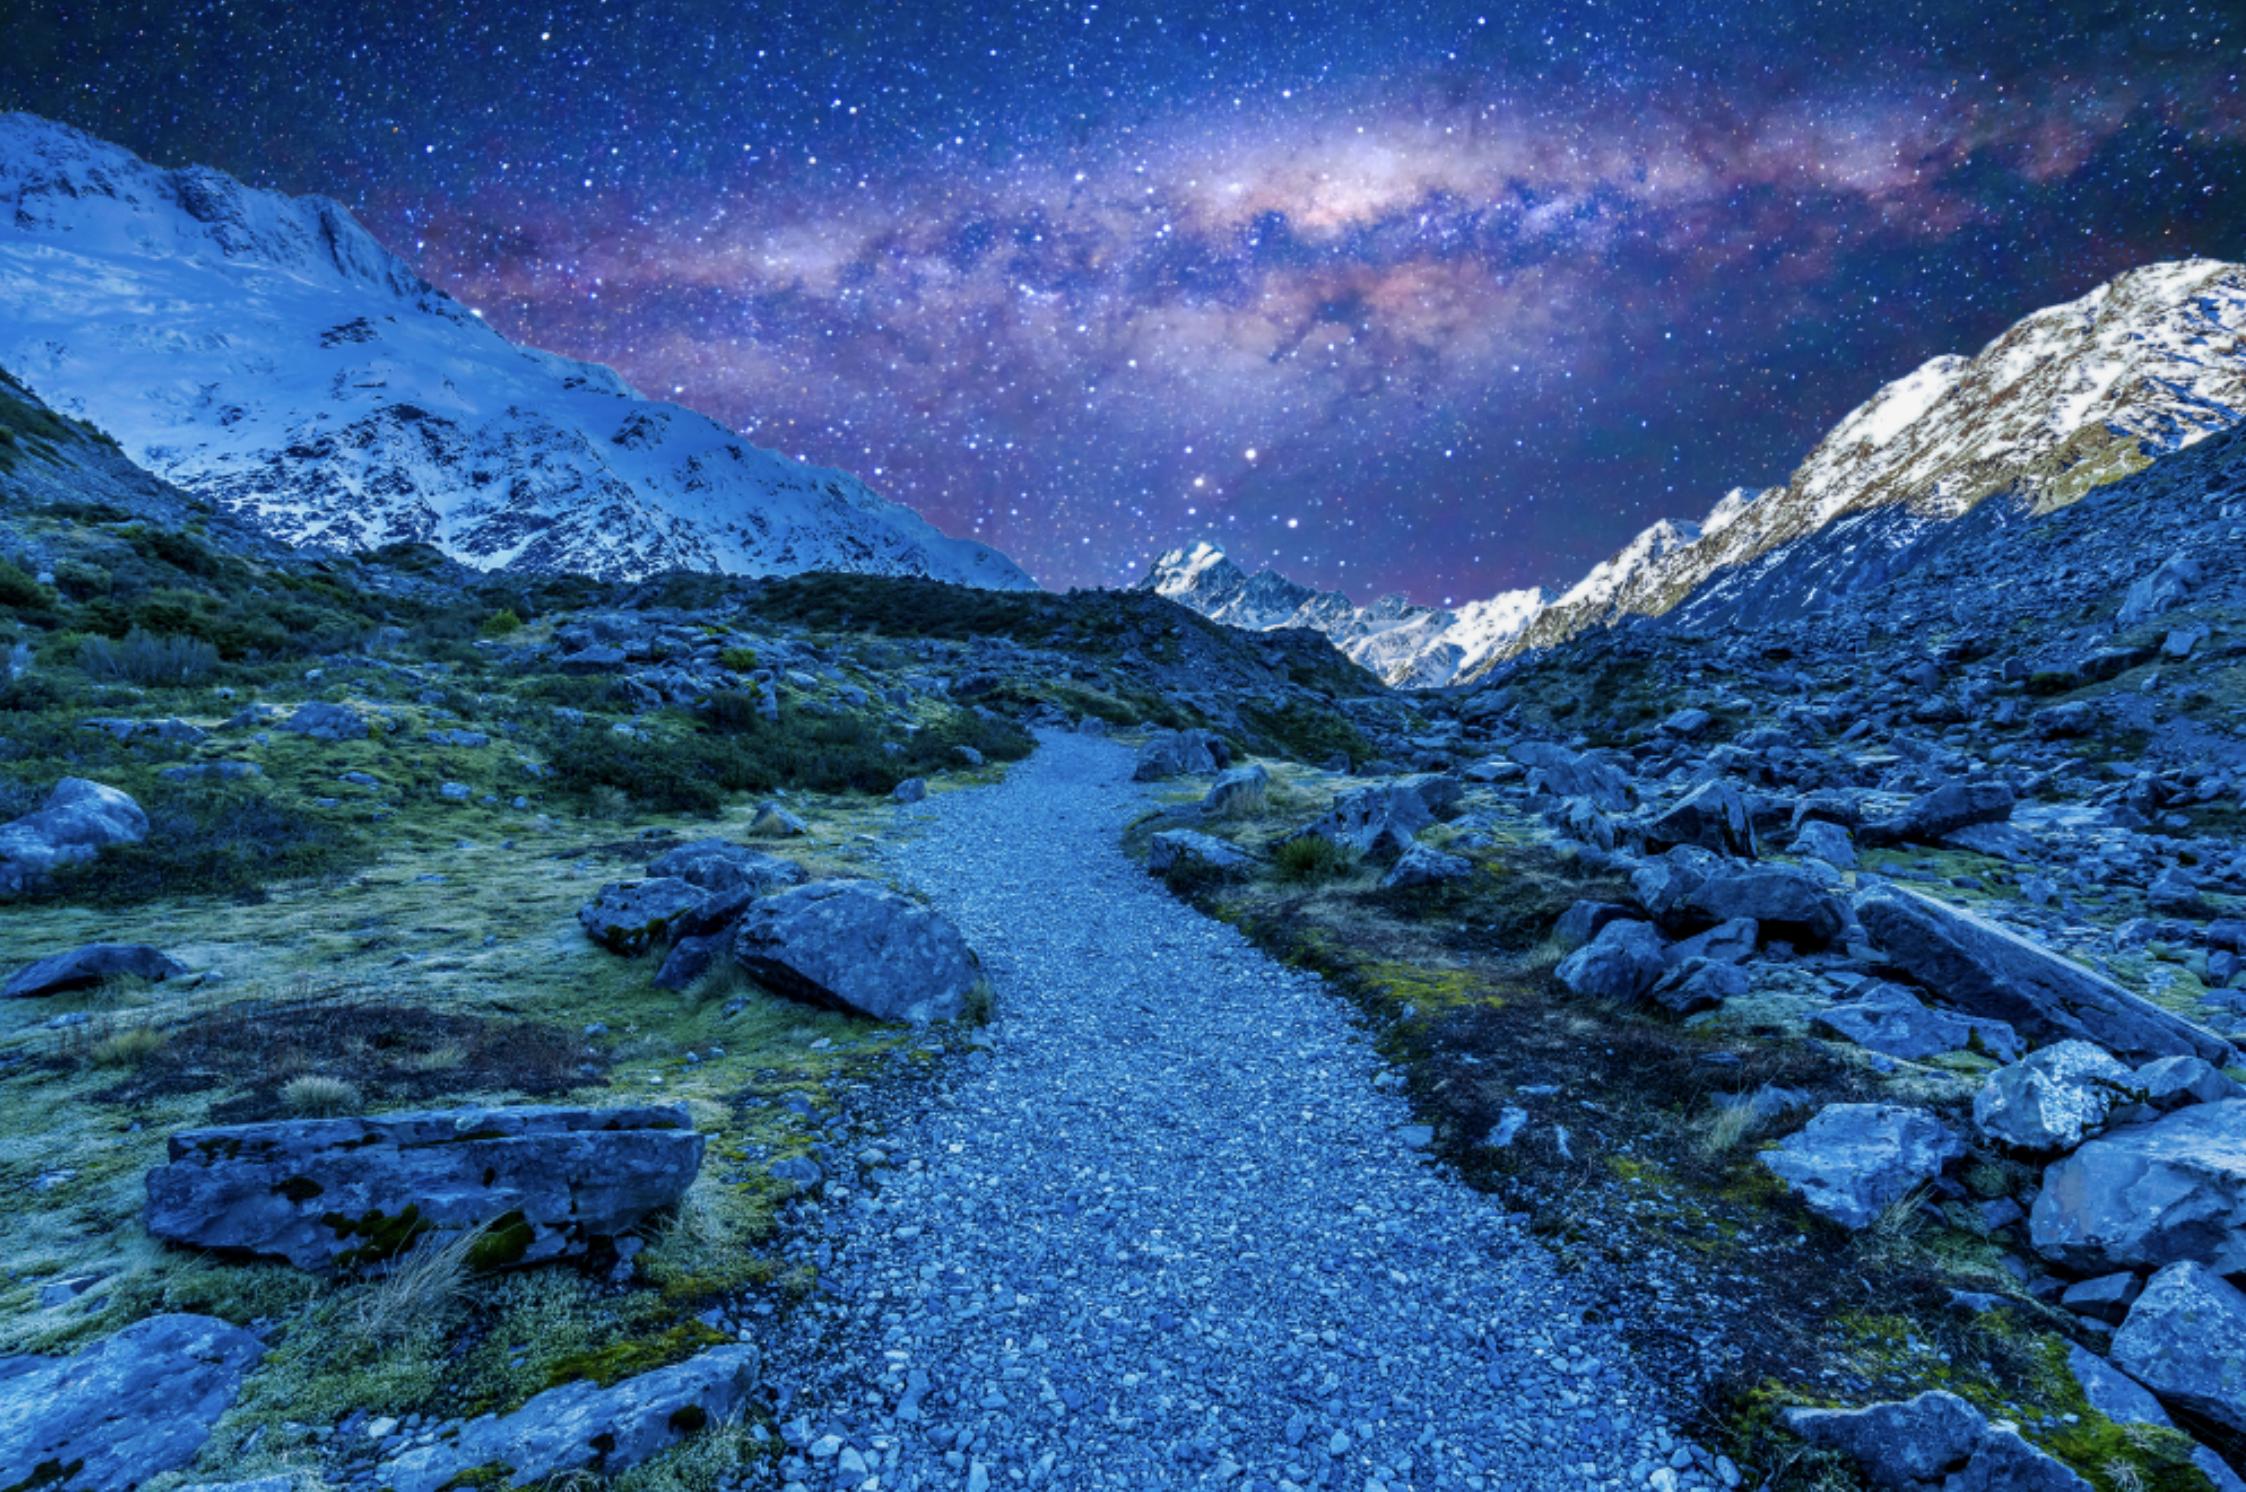 Aoraki/Mt. Cook National Park, New Zealand